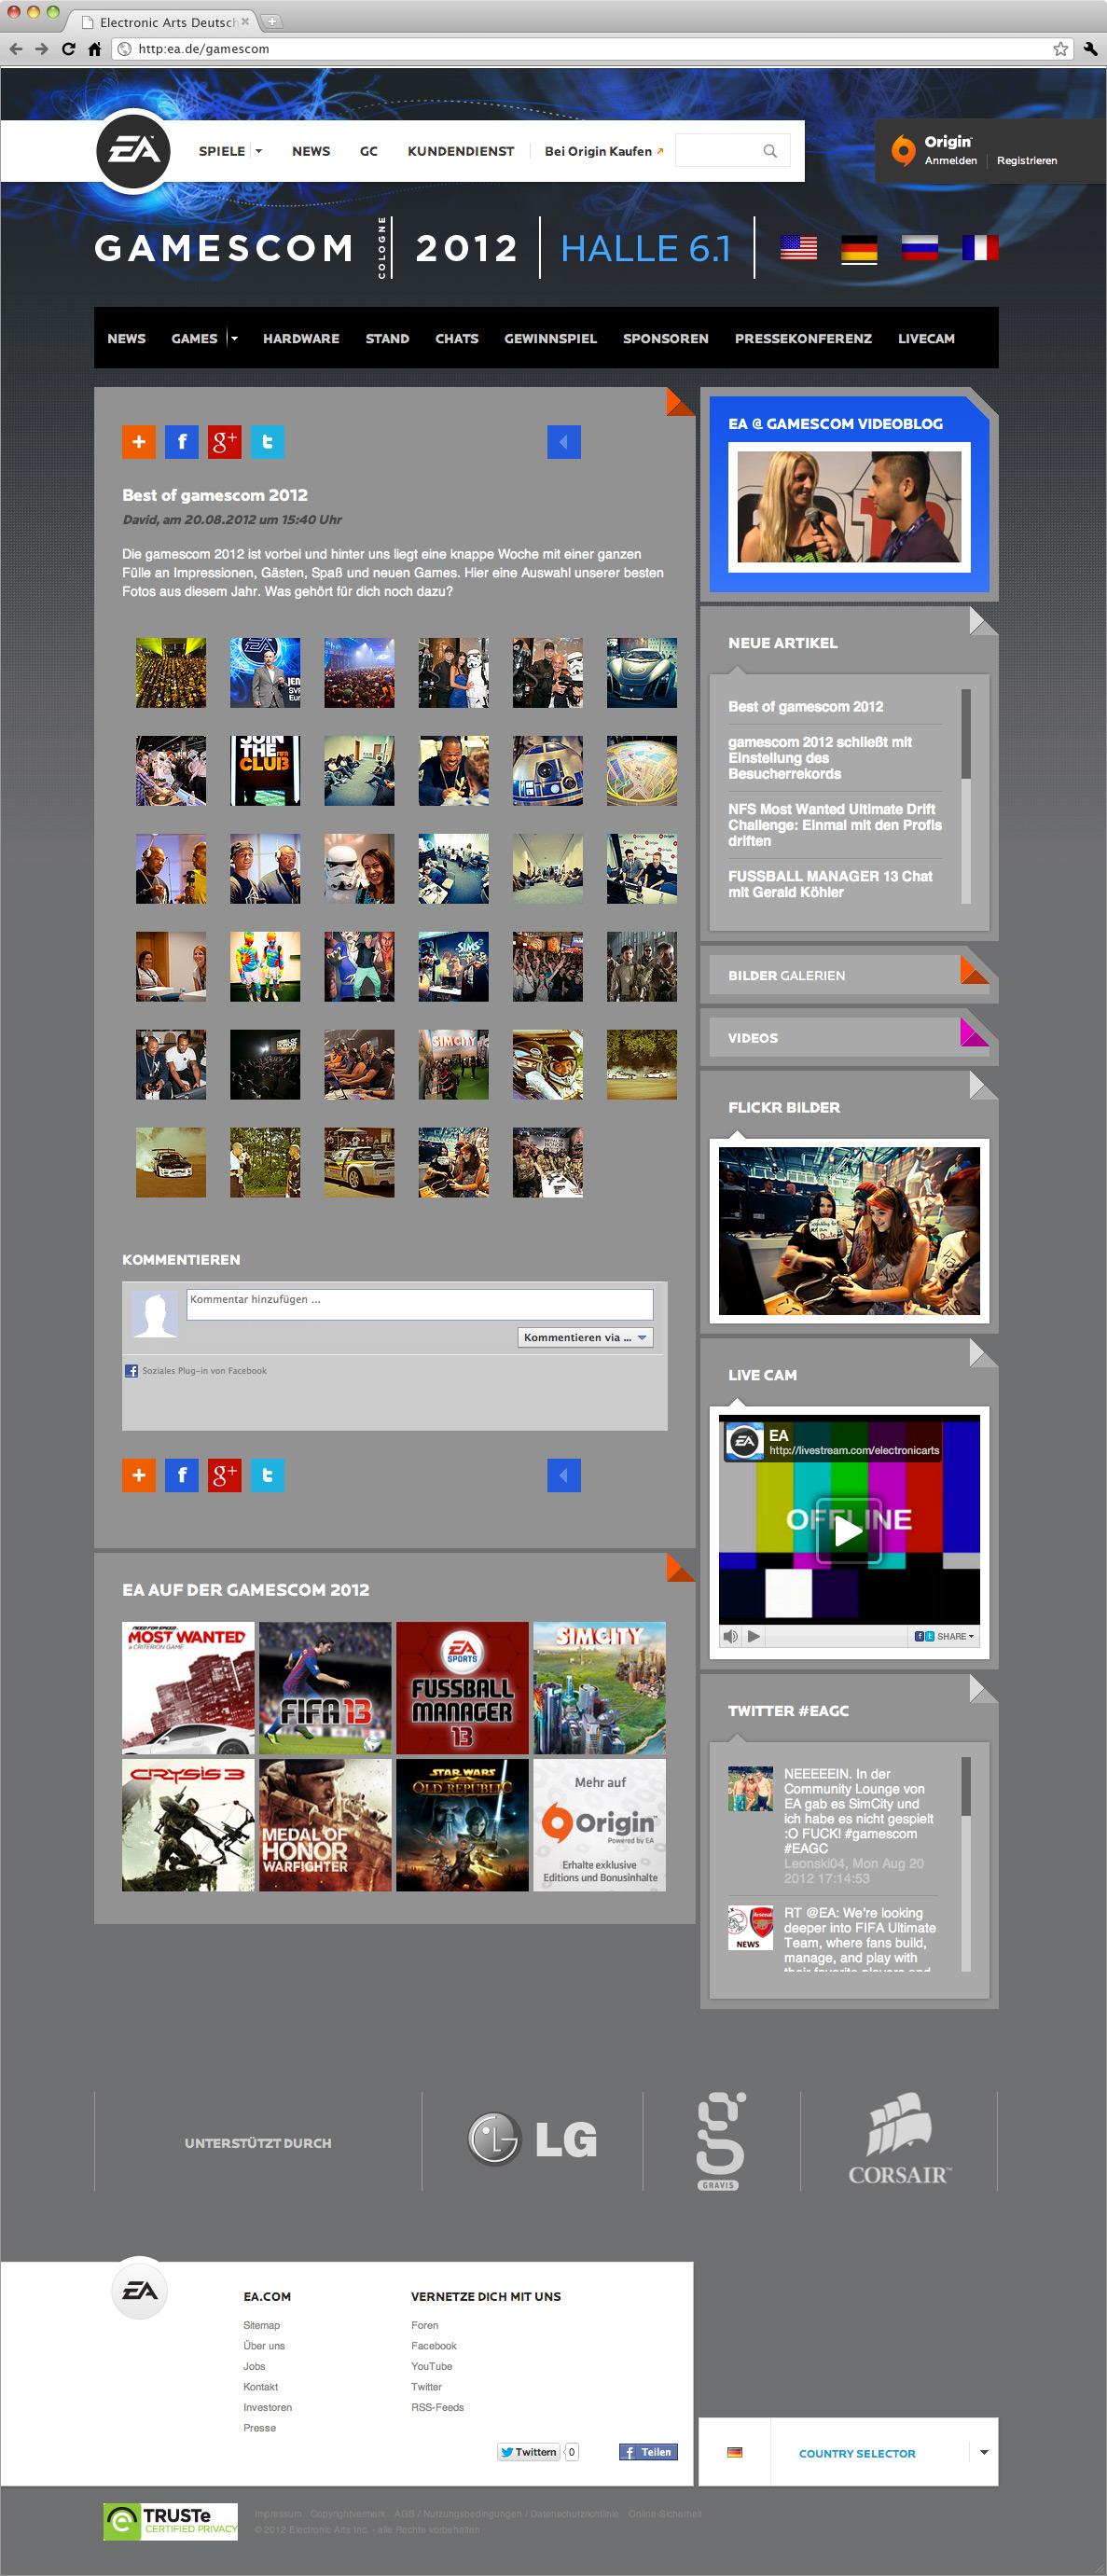 Webdesign-bildergalerie-ea-electronic-arts-at-gamescom-2012-cologne